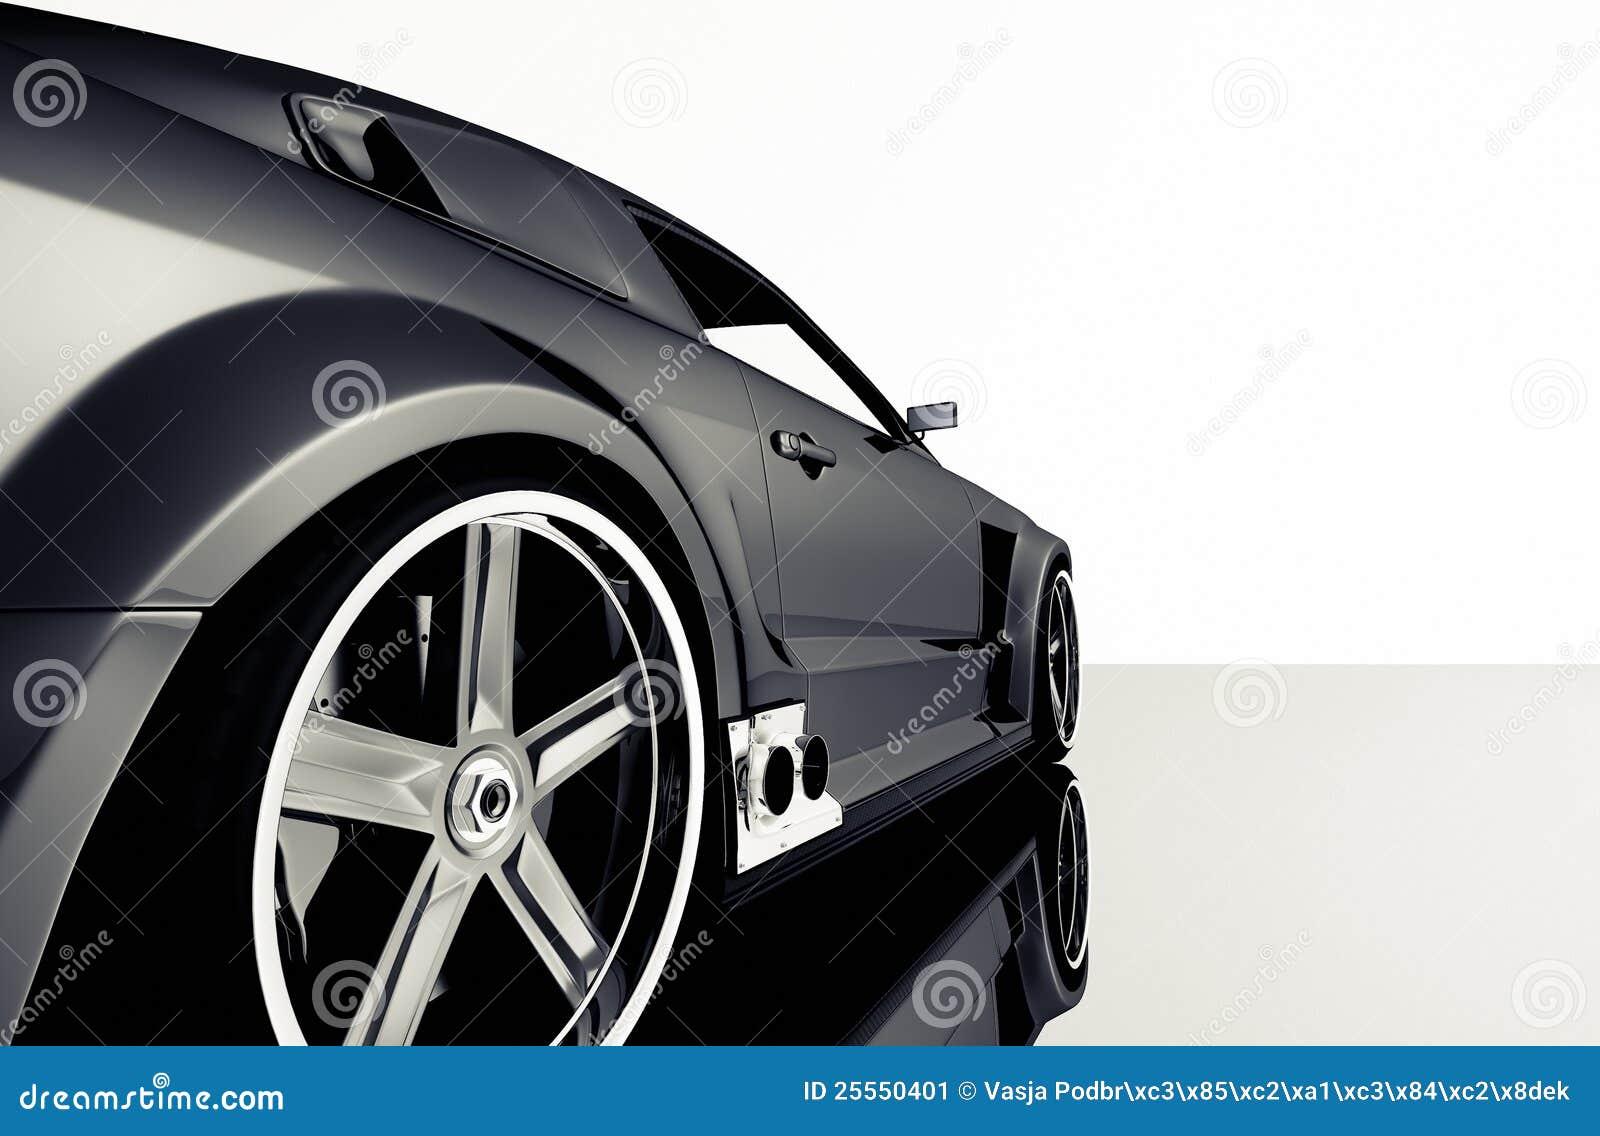 спорт детали автомобиля